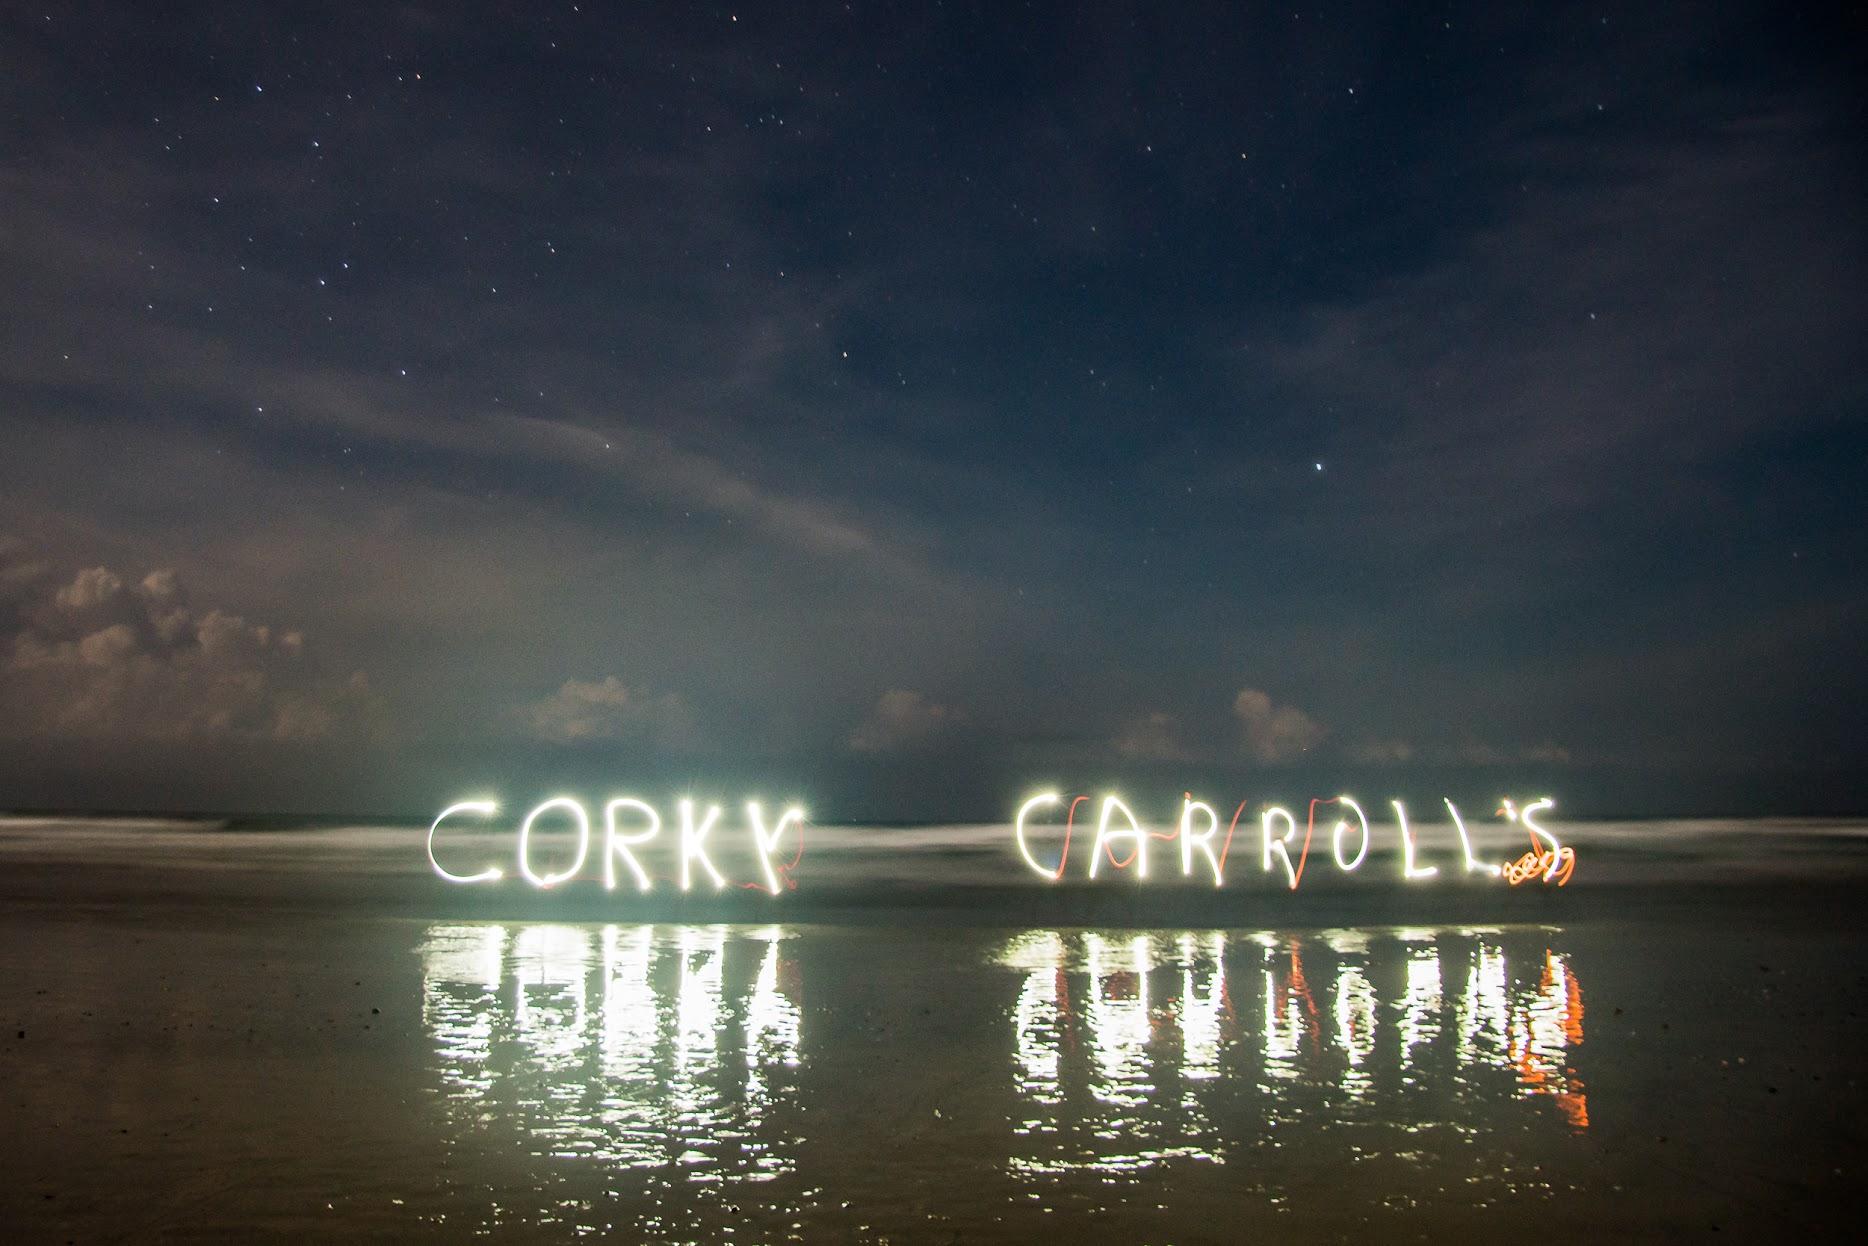 corkycarrolls